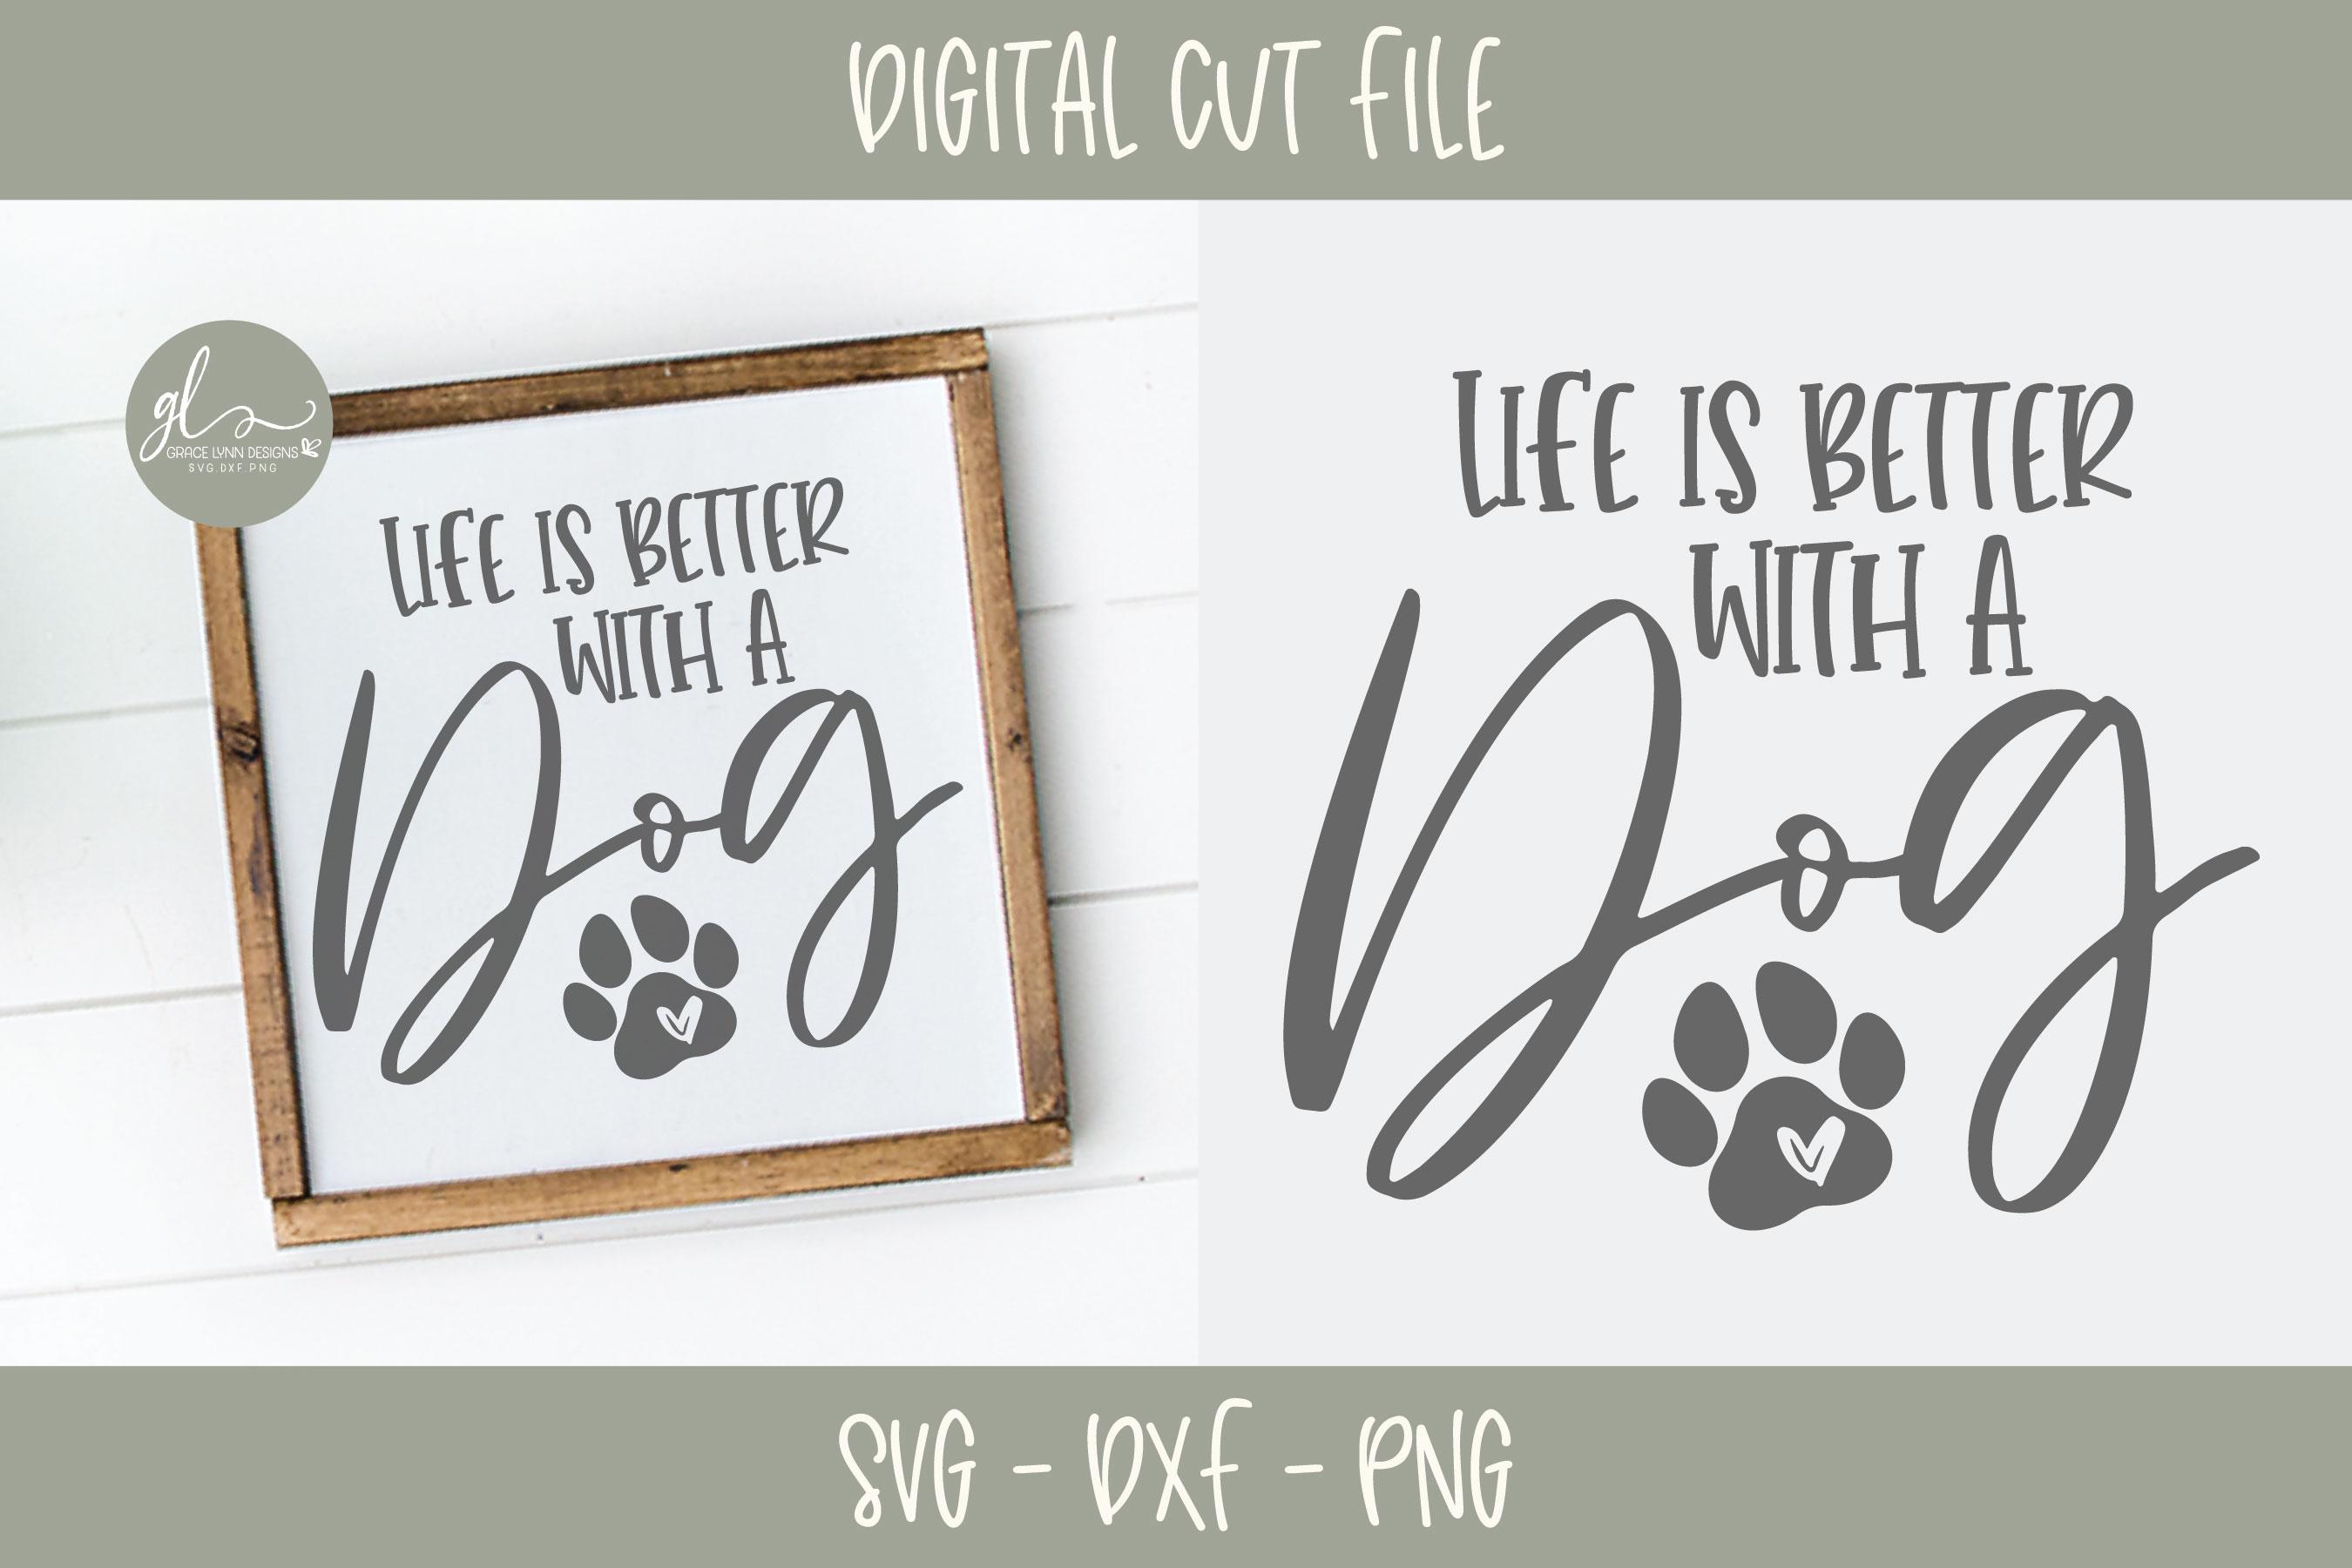 Dog Quotes Bundle Vol. 2 - 10 Designs - SVG Cut Files example image 7